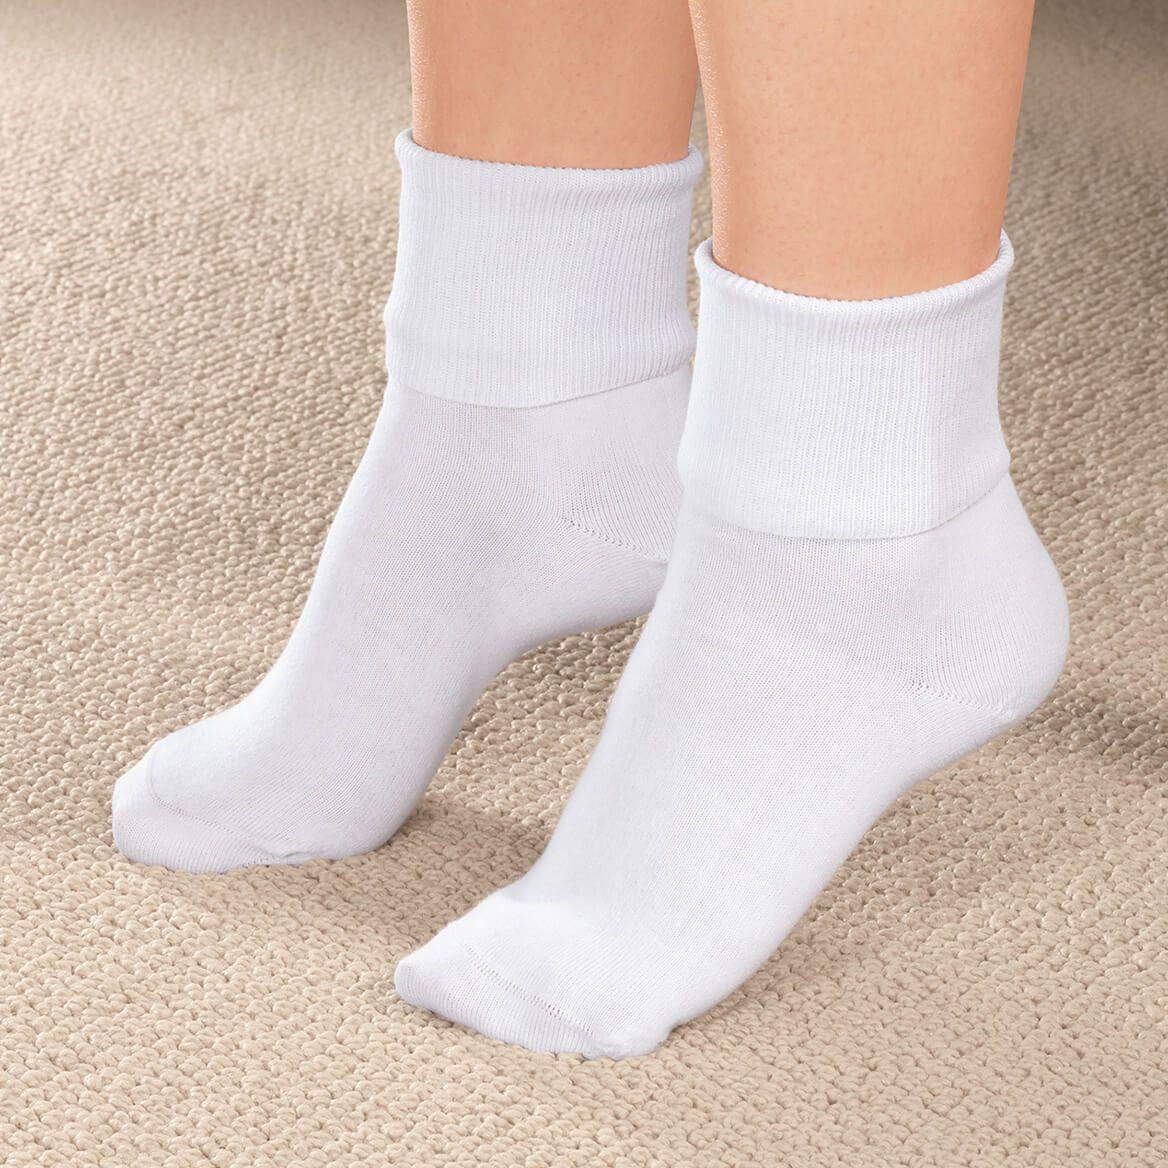 Buster Brown® Ankle Socks, 3 Pairs-337089